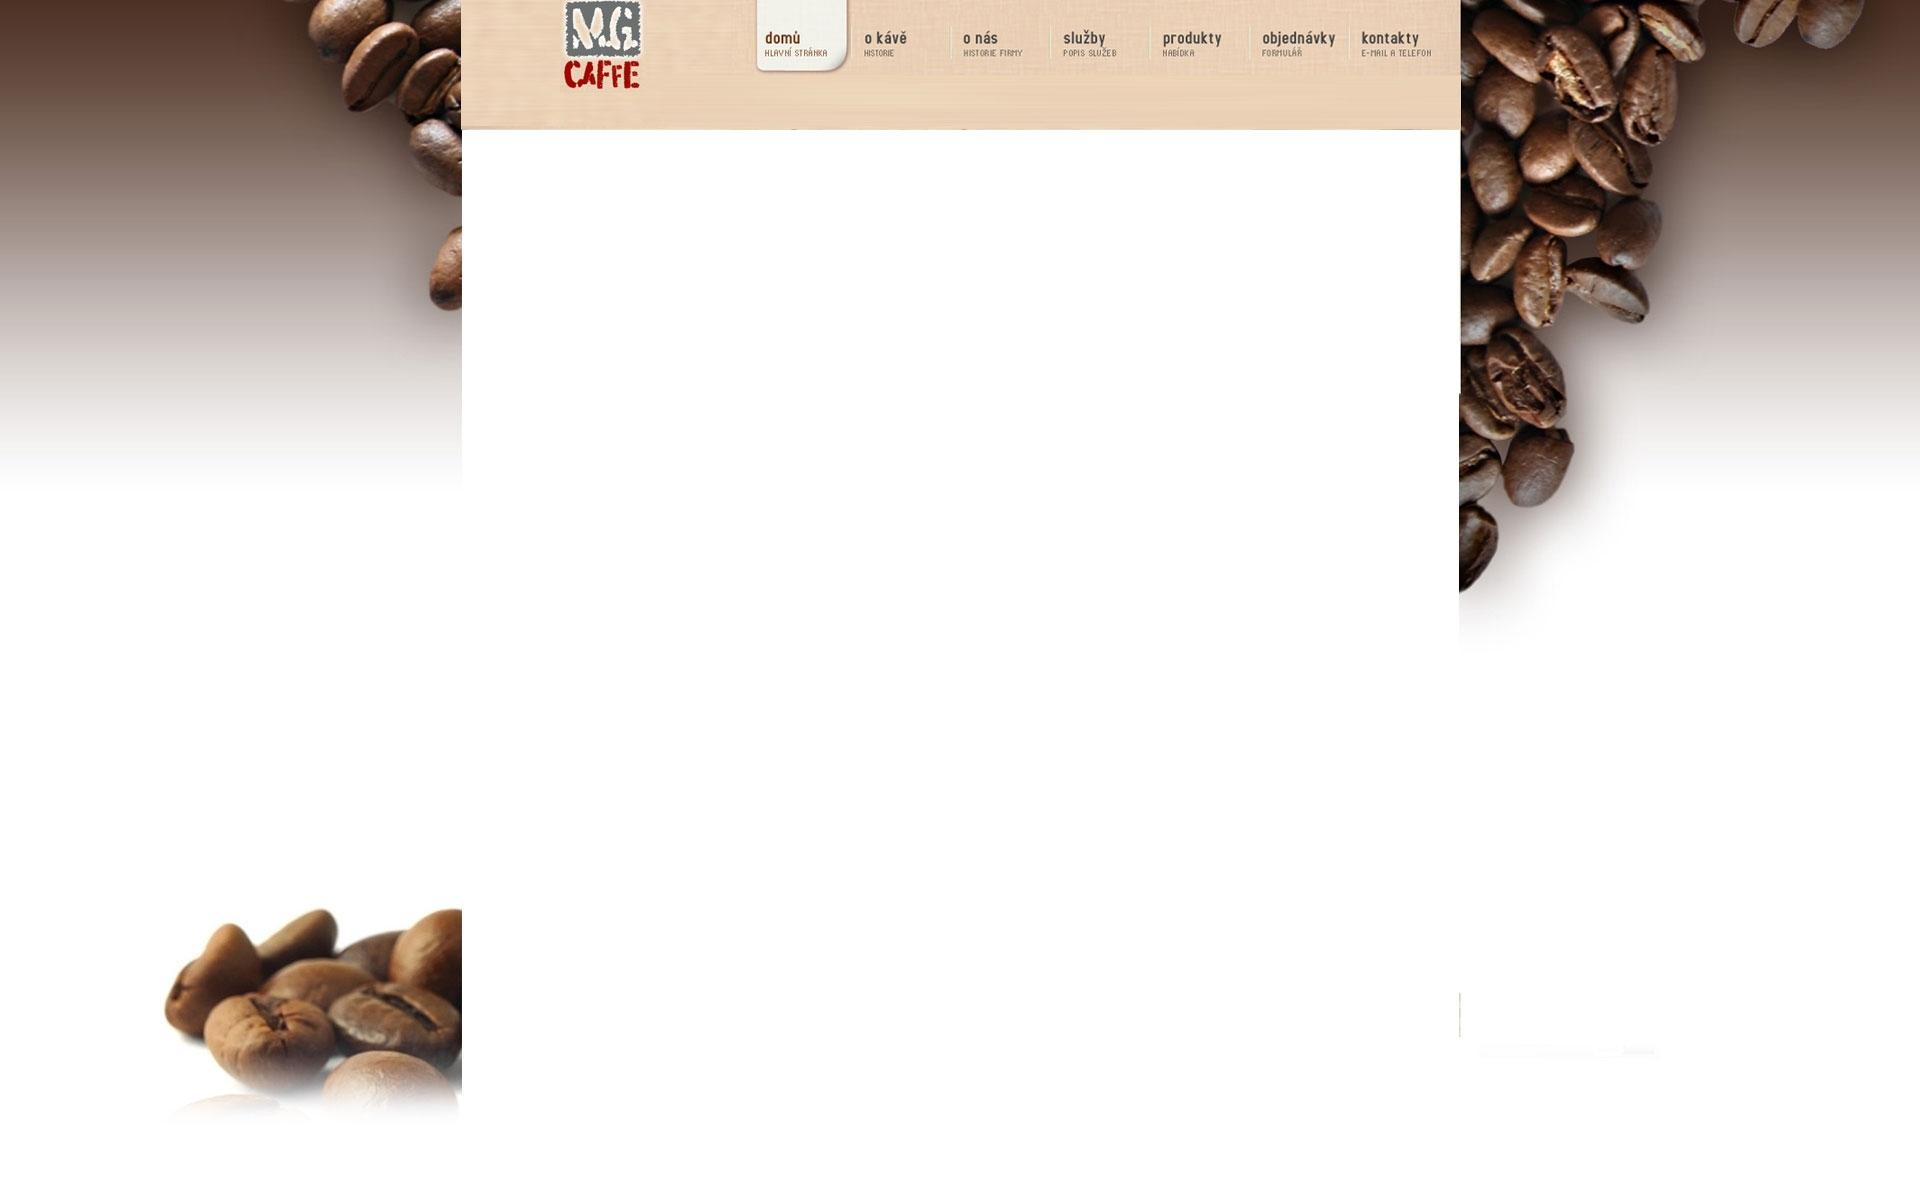 MGcaffe